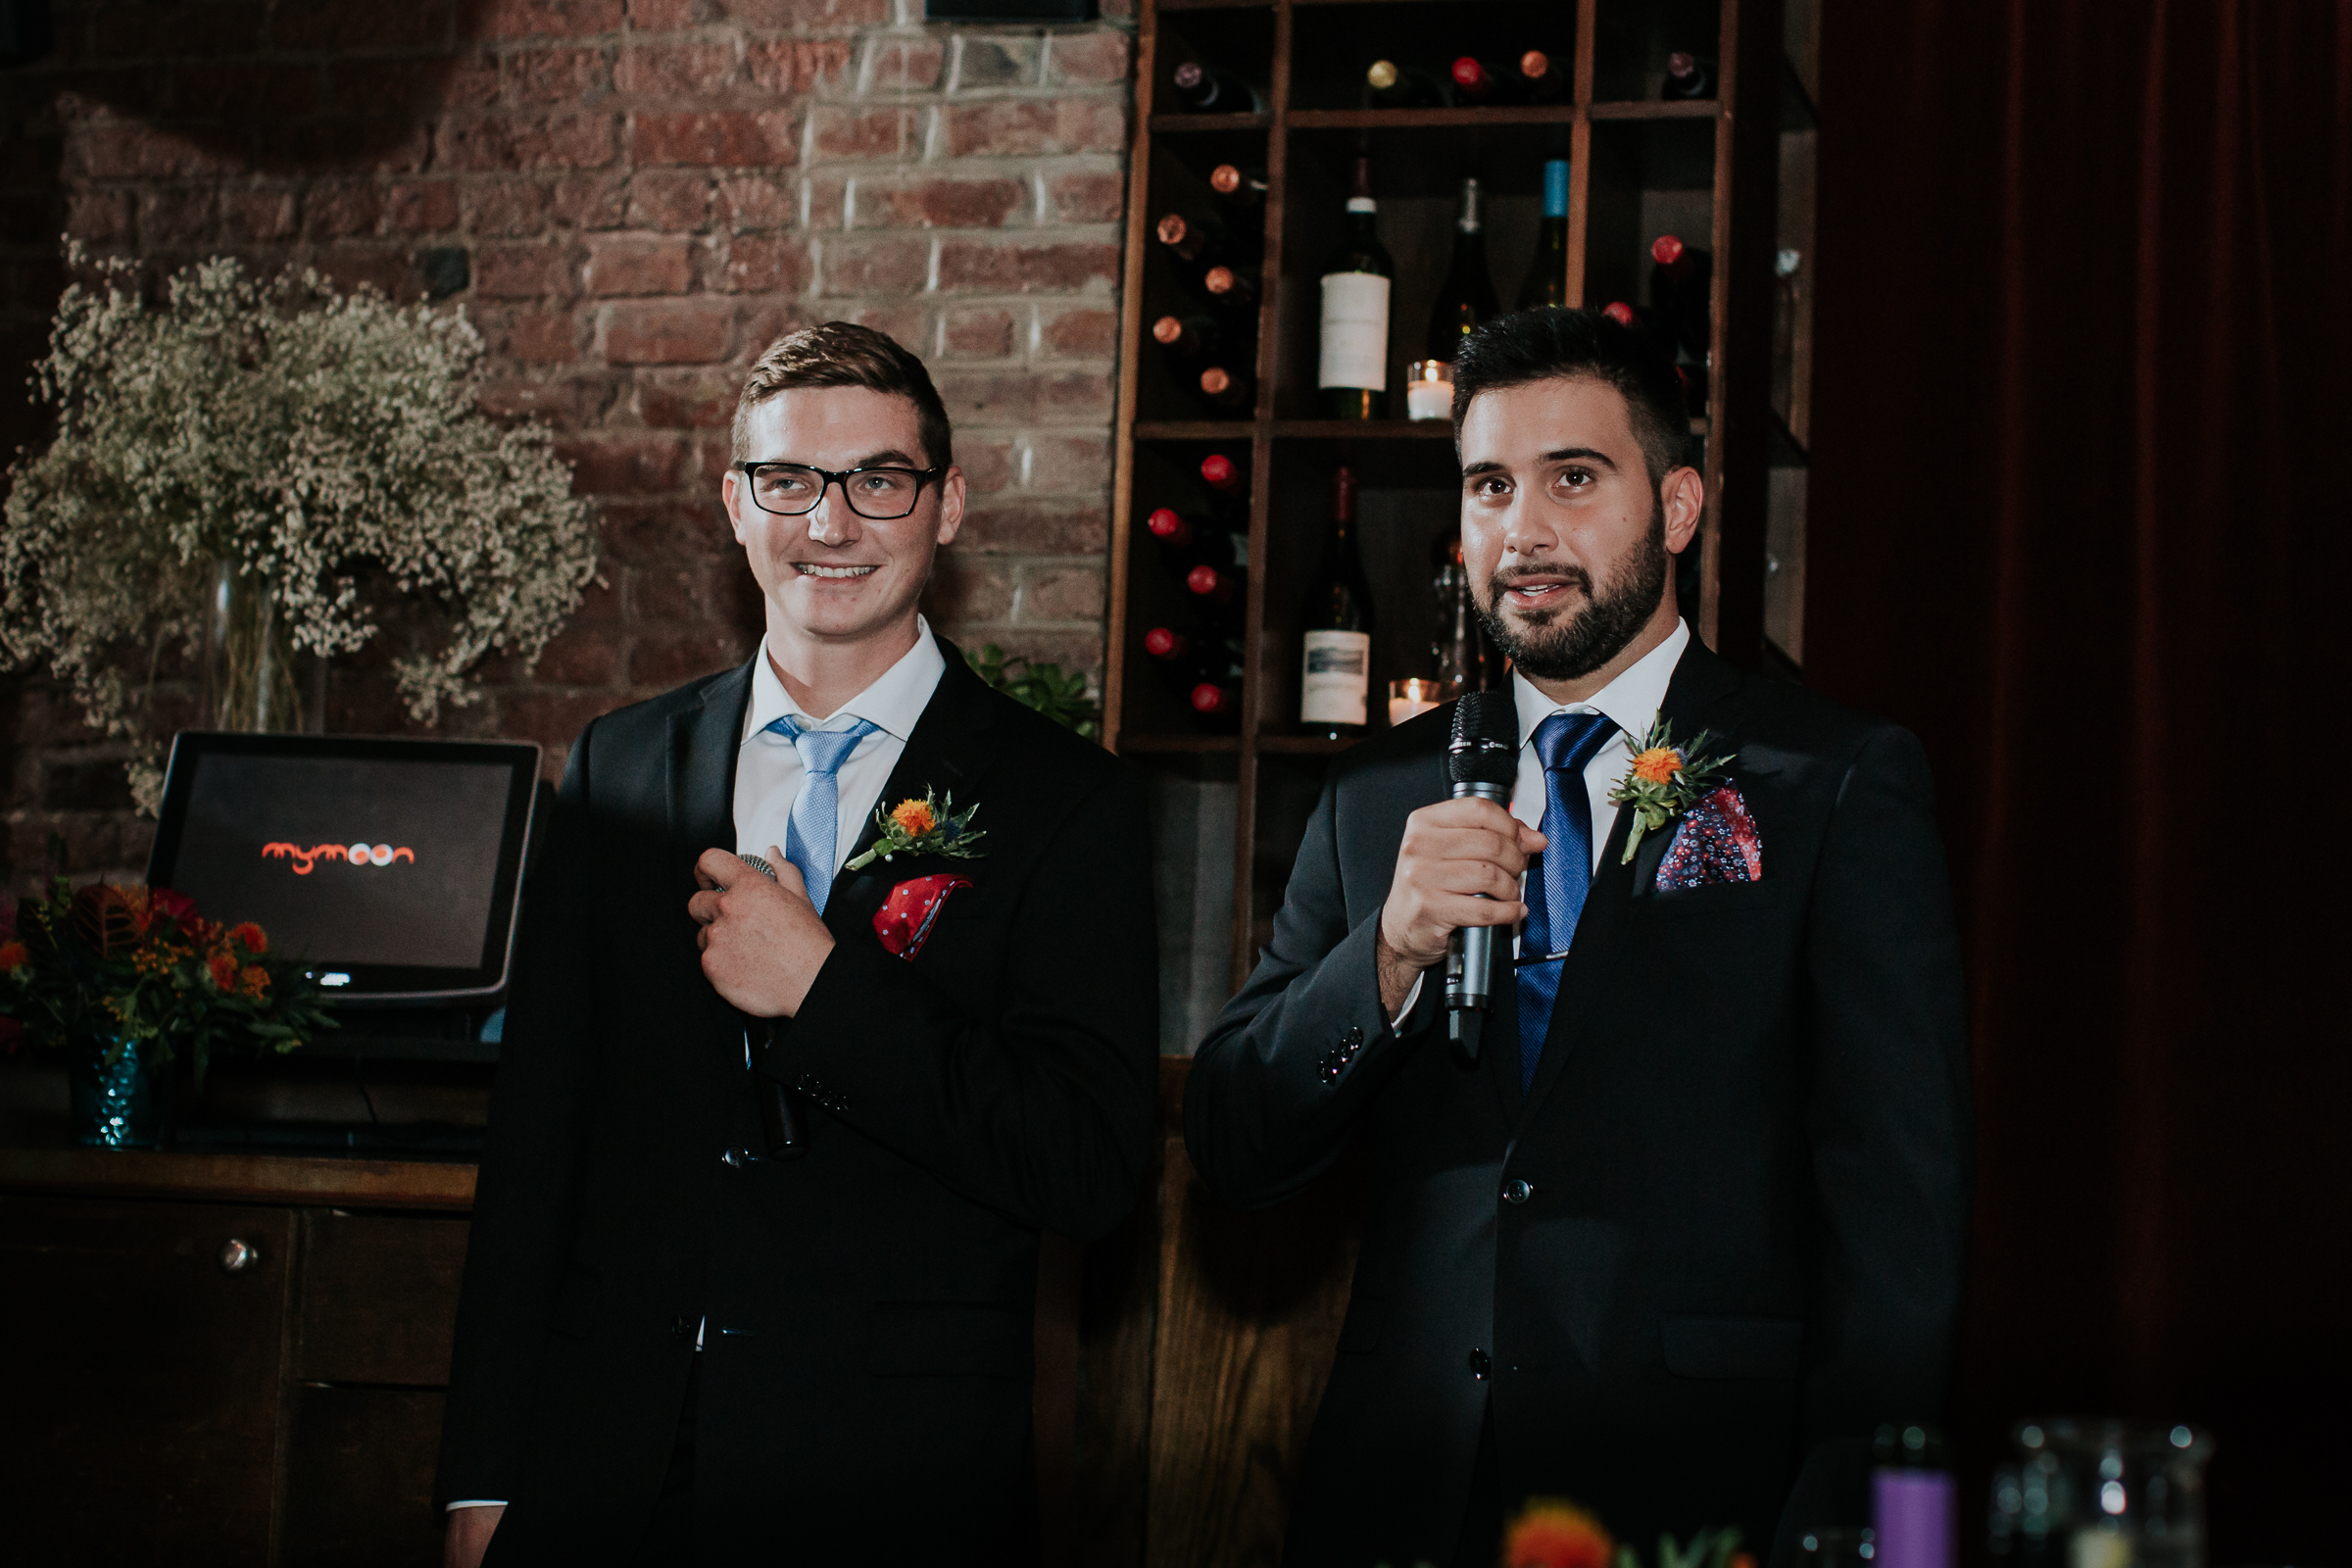 My-Moon-Brooklyn-LGBT-Gay-Documentary-Wedding-Photographer-98.jpg